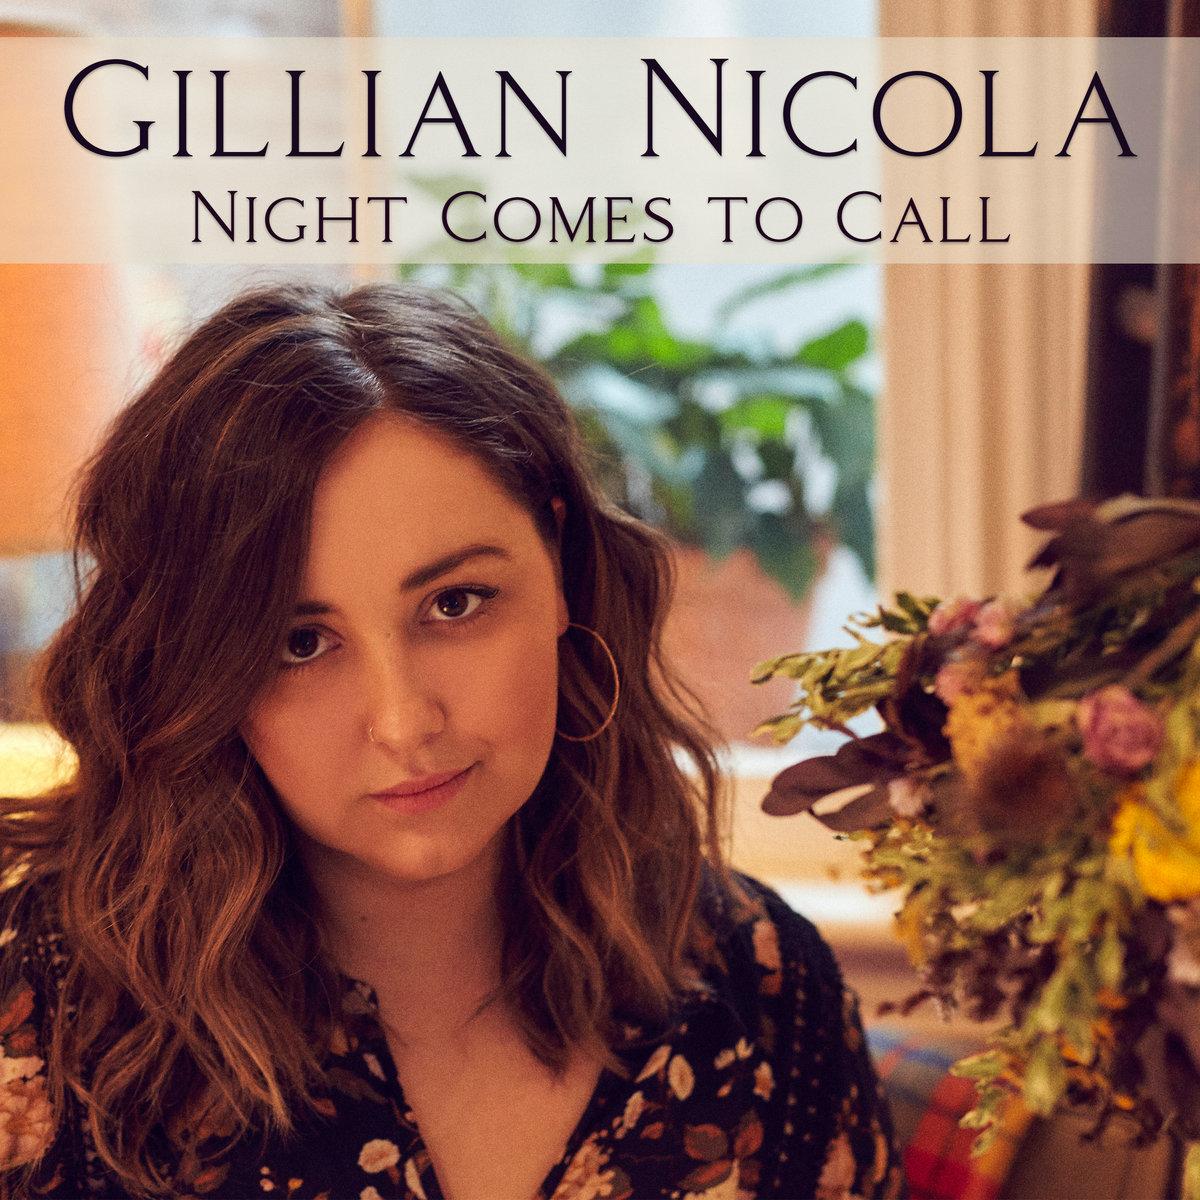 Night Comes to Call by Gillian Nicola